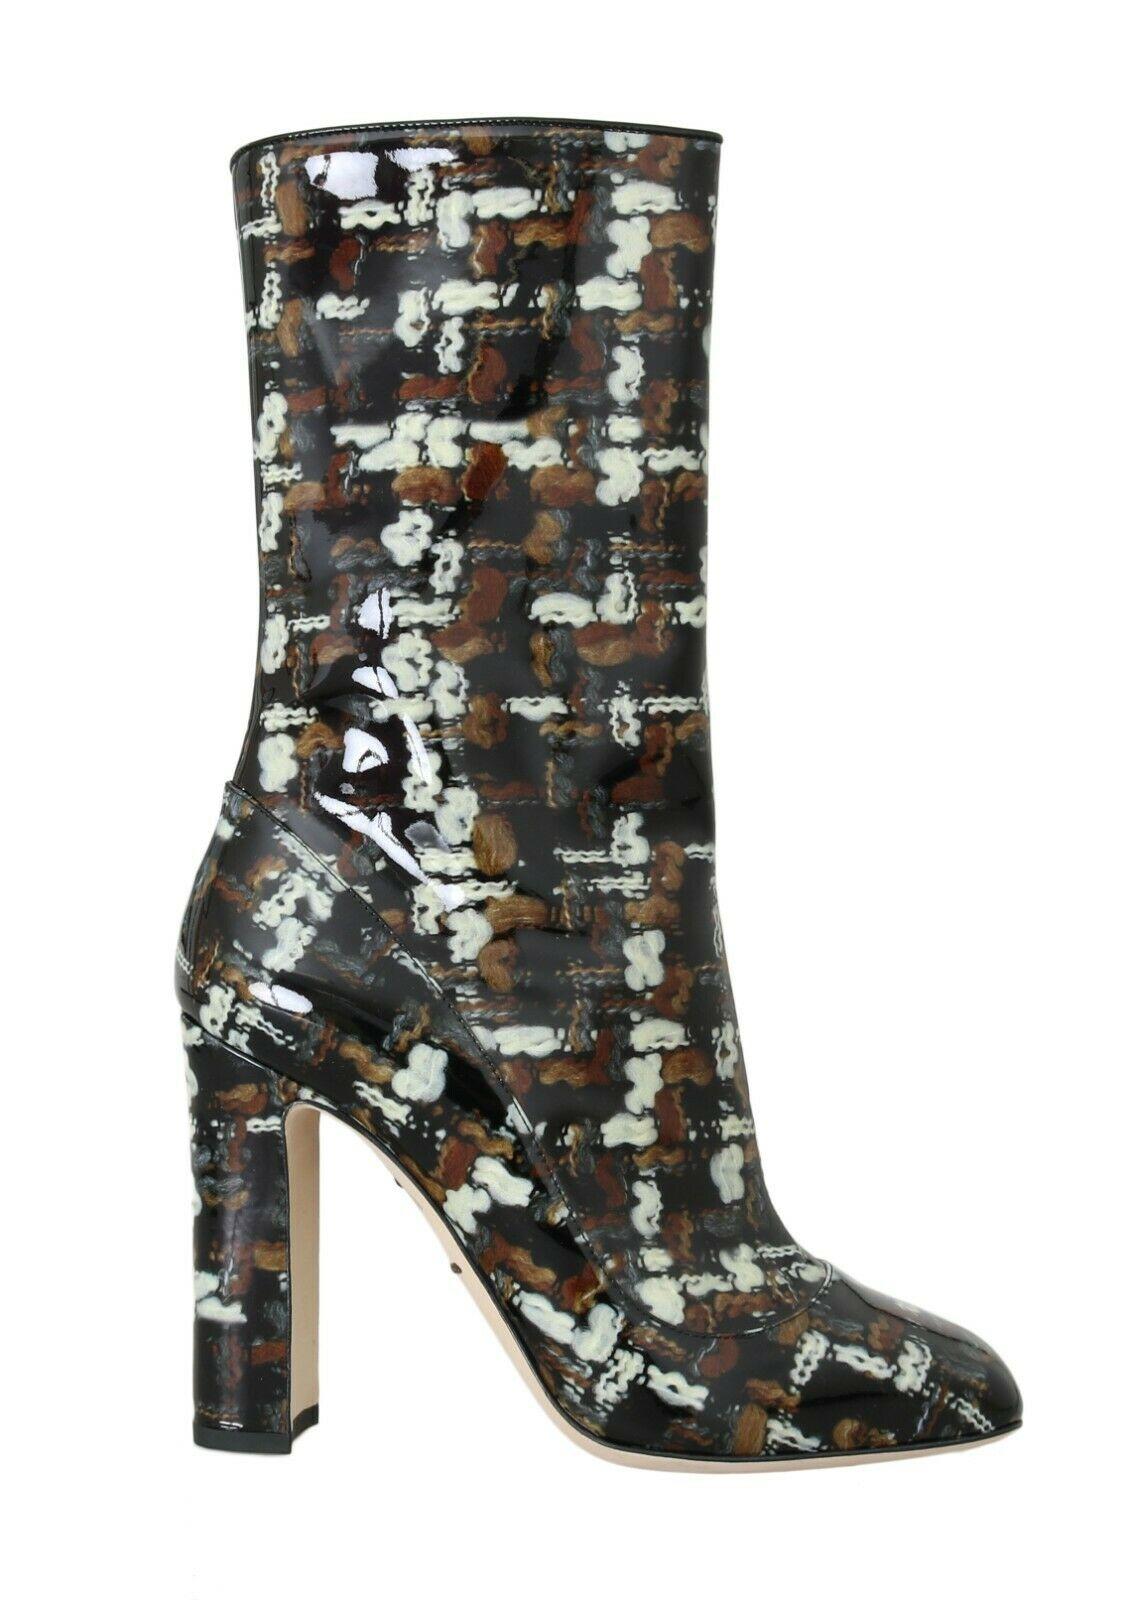 Dolce & Gabbana Women's Rain Calf Leather Boot Black LA4184 - EU37.5/US7